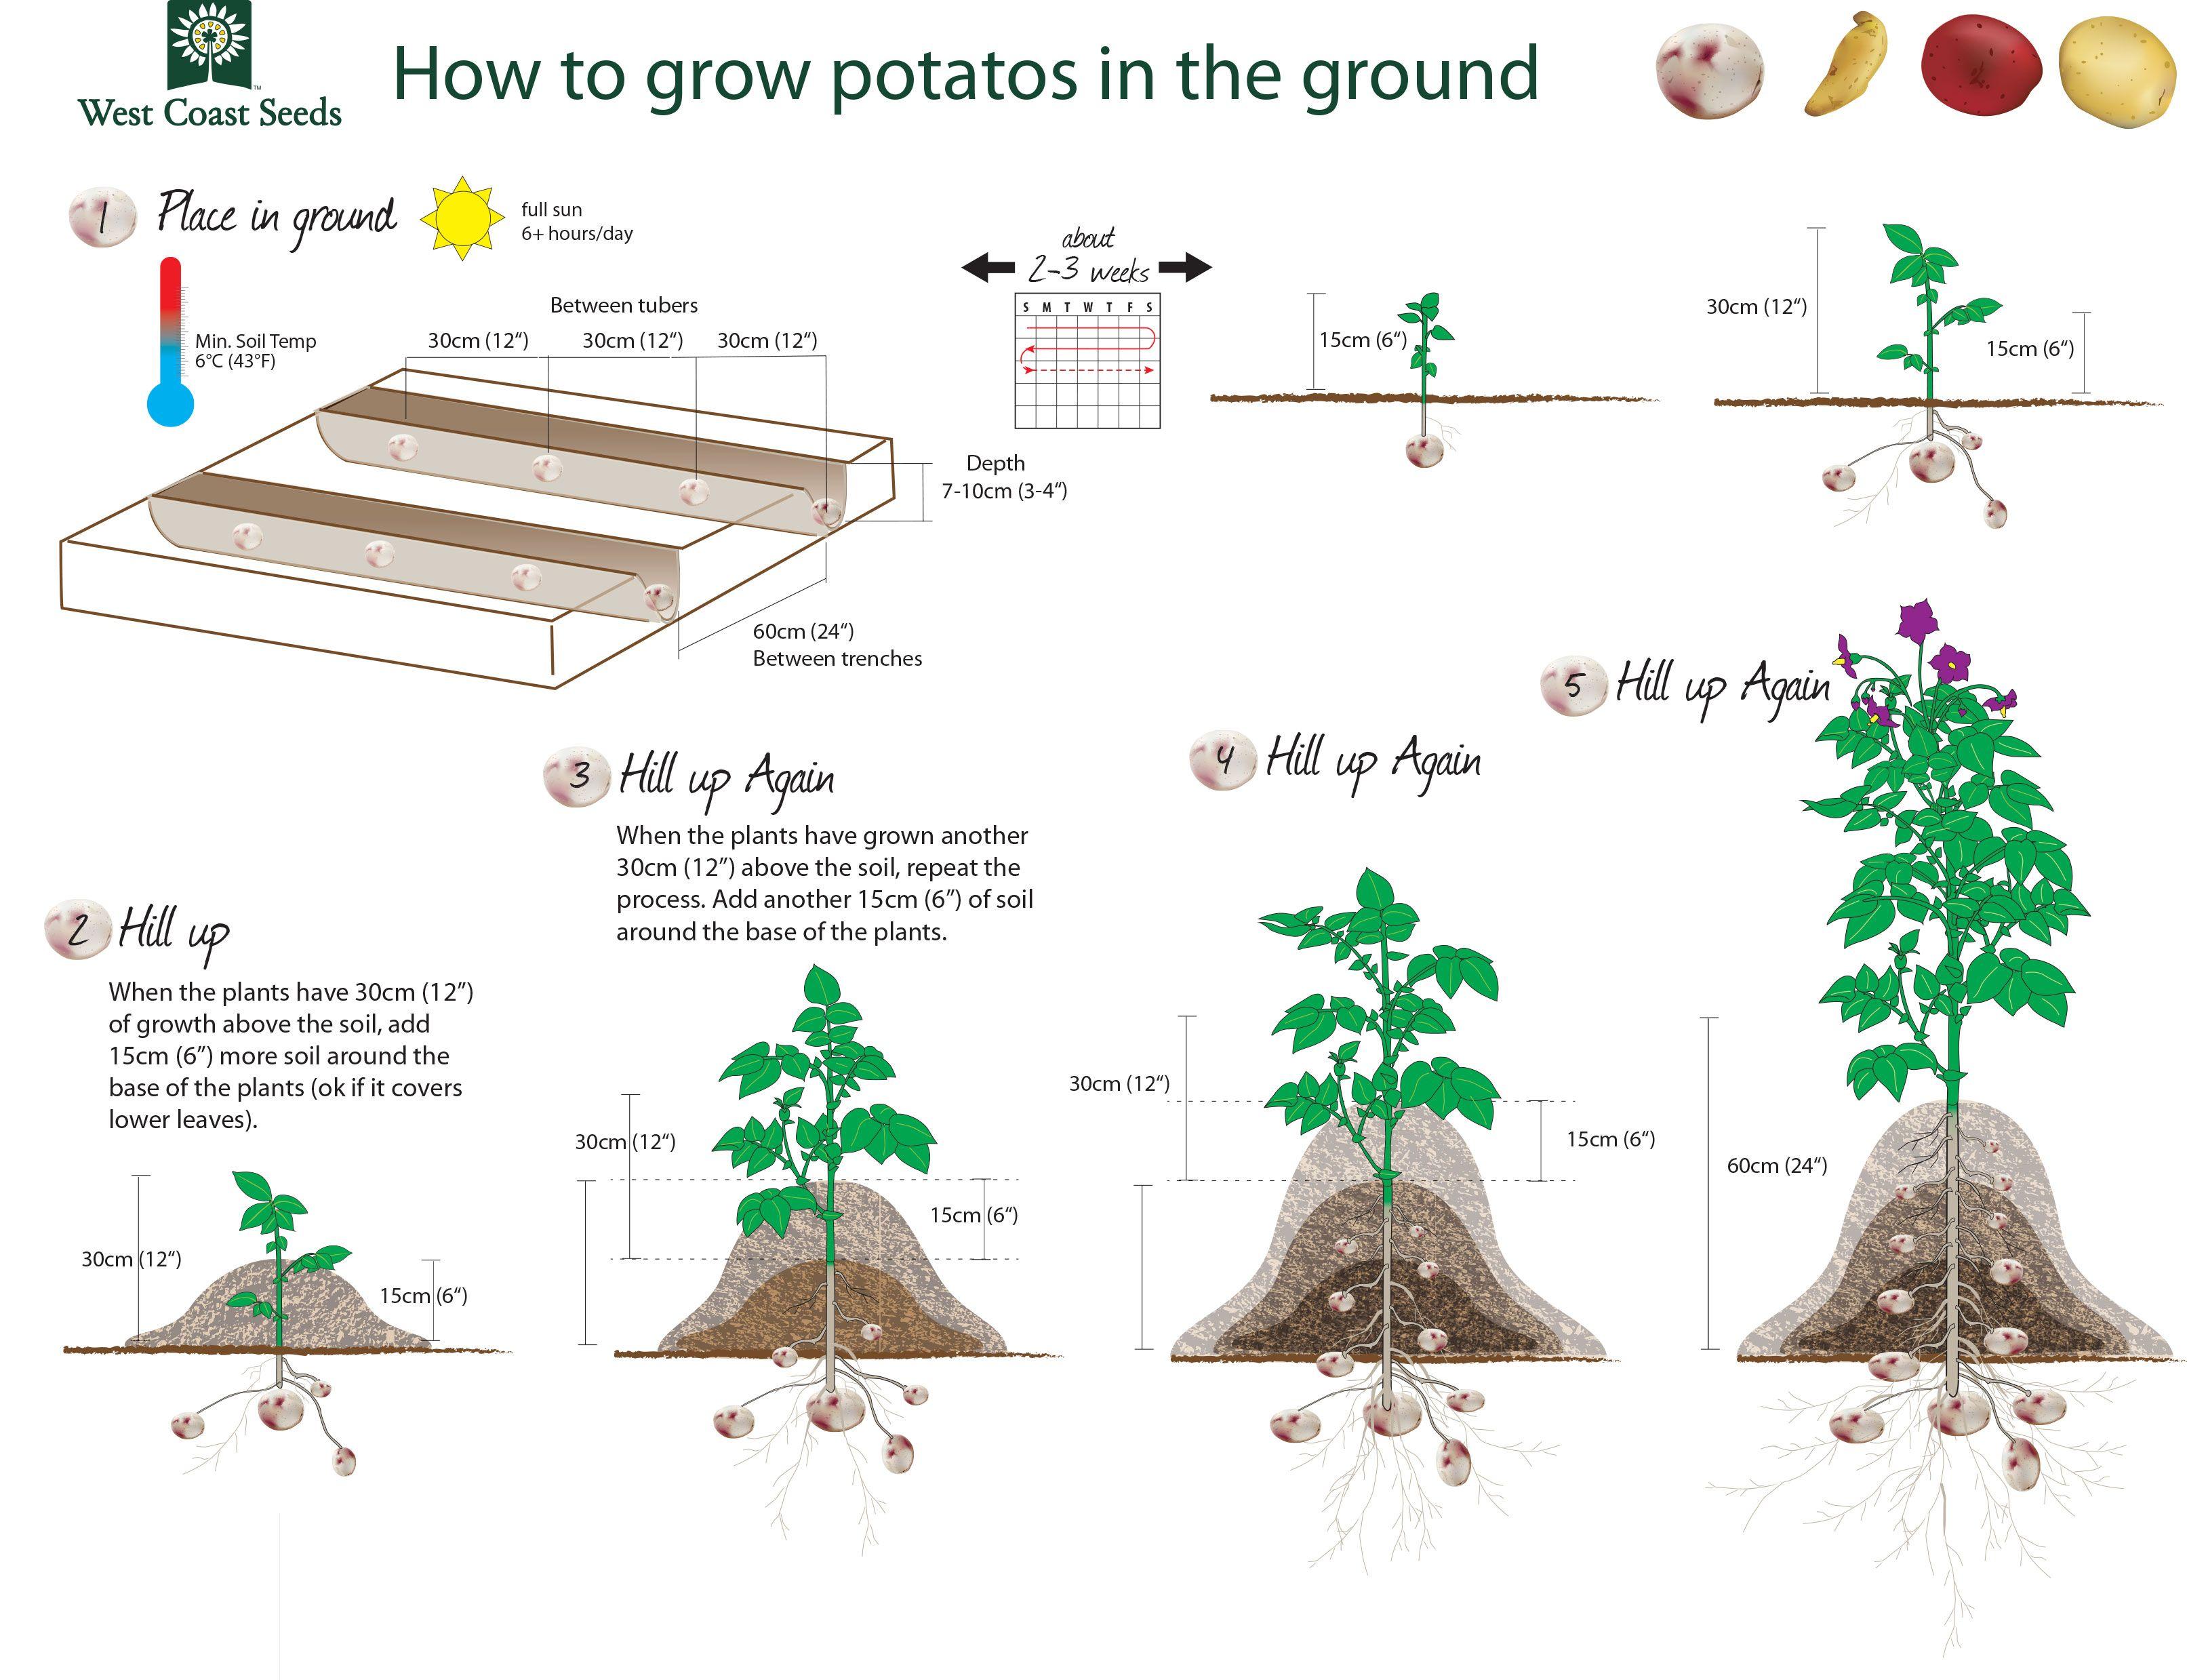 How to grow potatoes growing potatoes planting potatoes